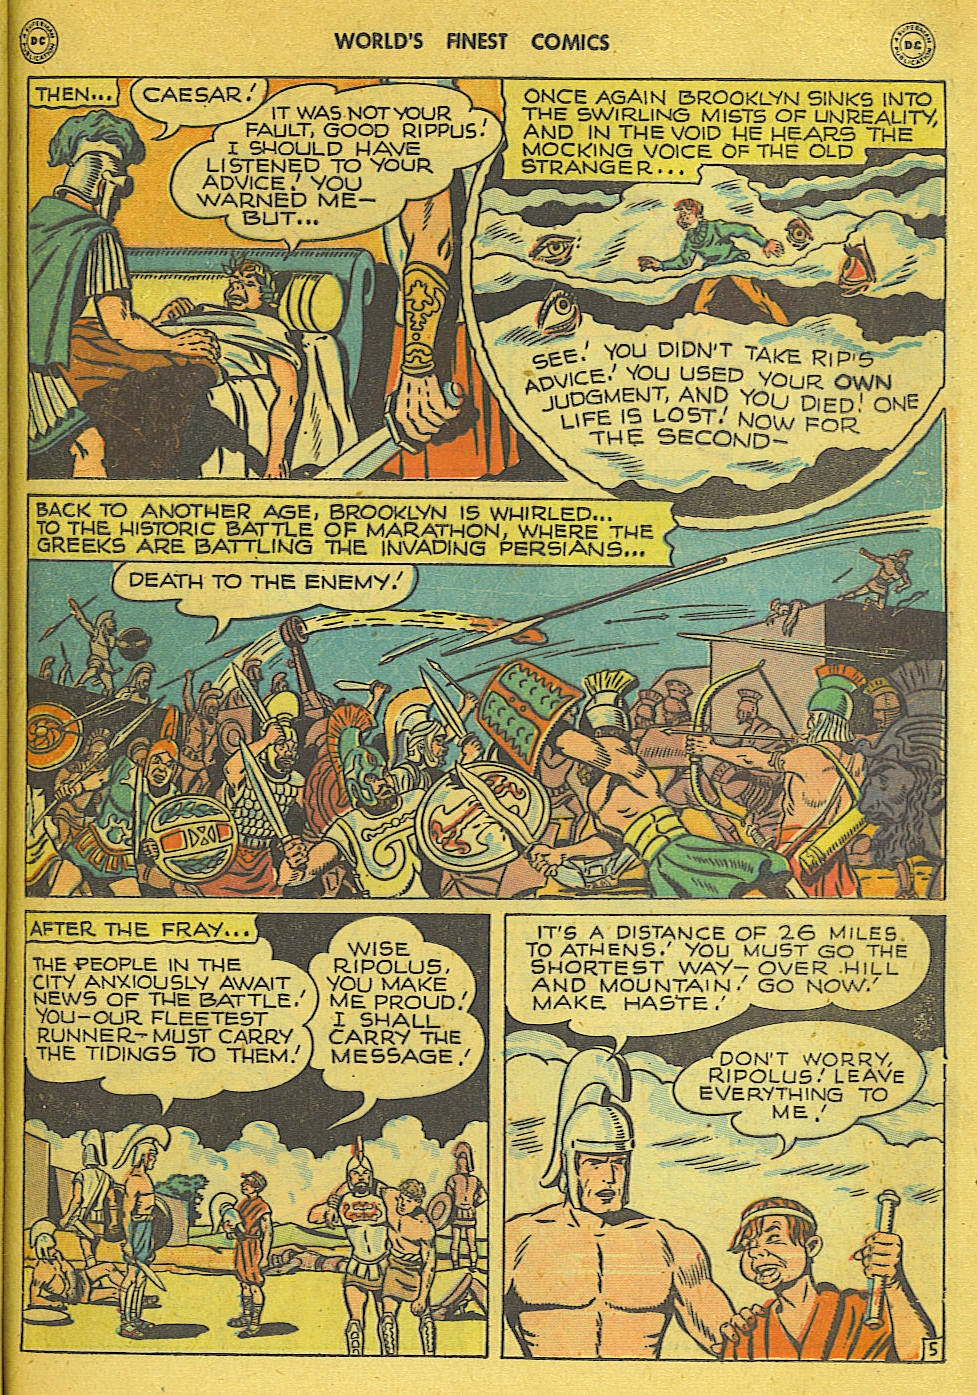 Read online World's Finest Comics comic -  Issue #34 - 31